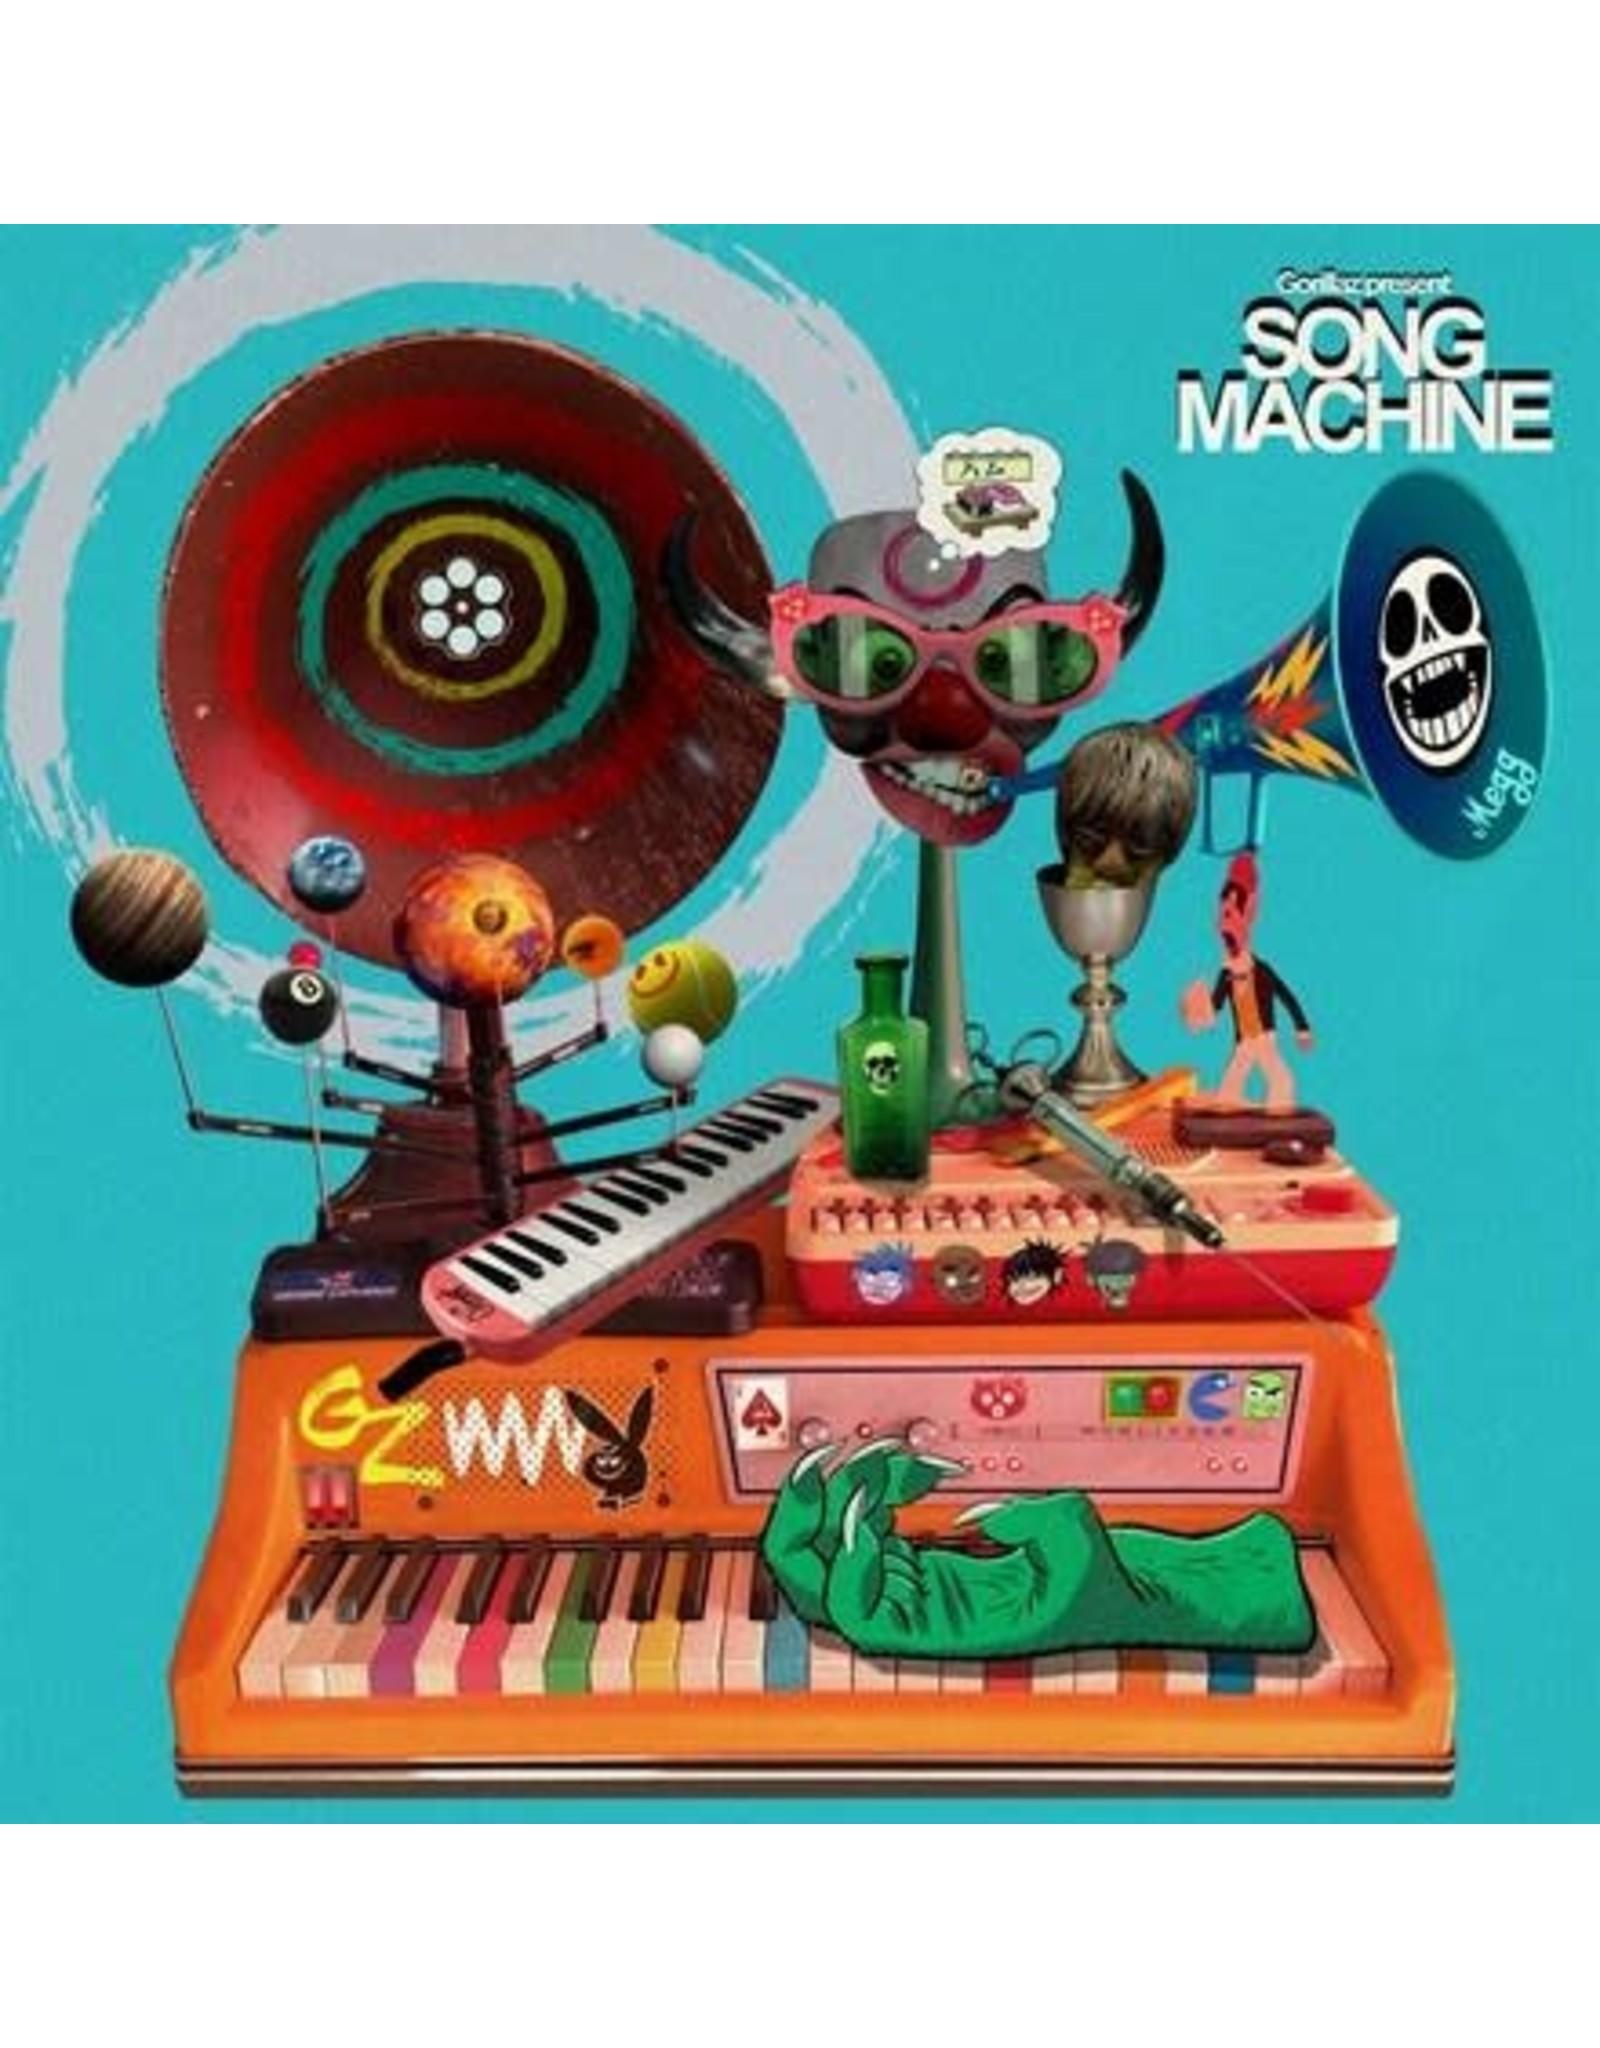 Gorillaz - Song Machine S1 Yellow Ltd LP